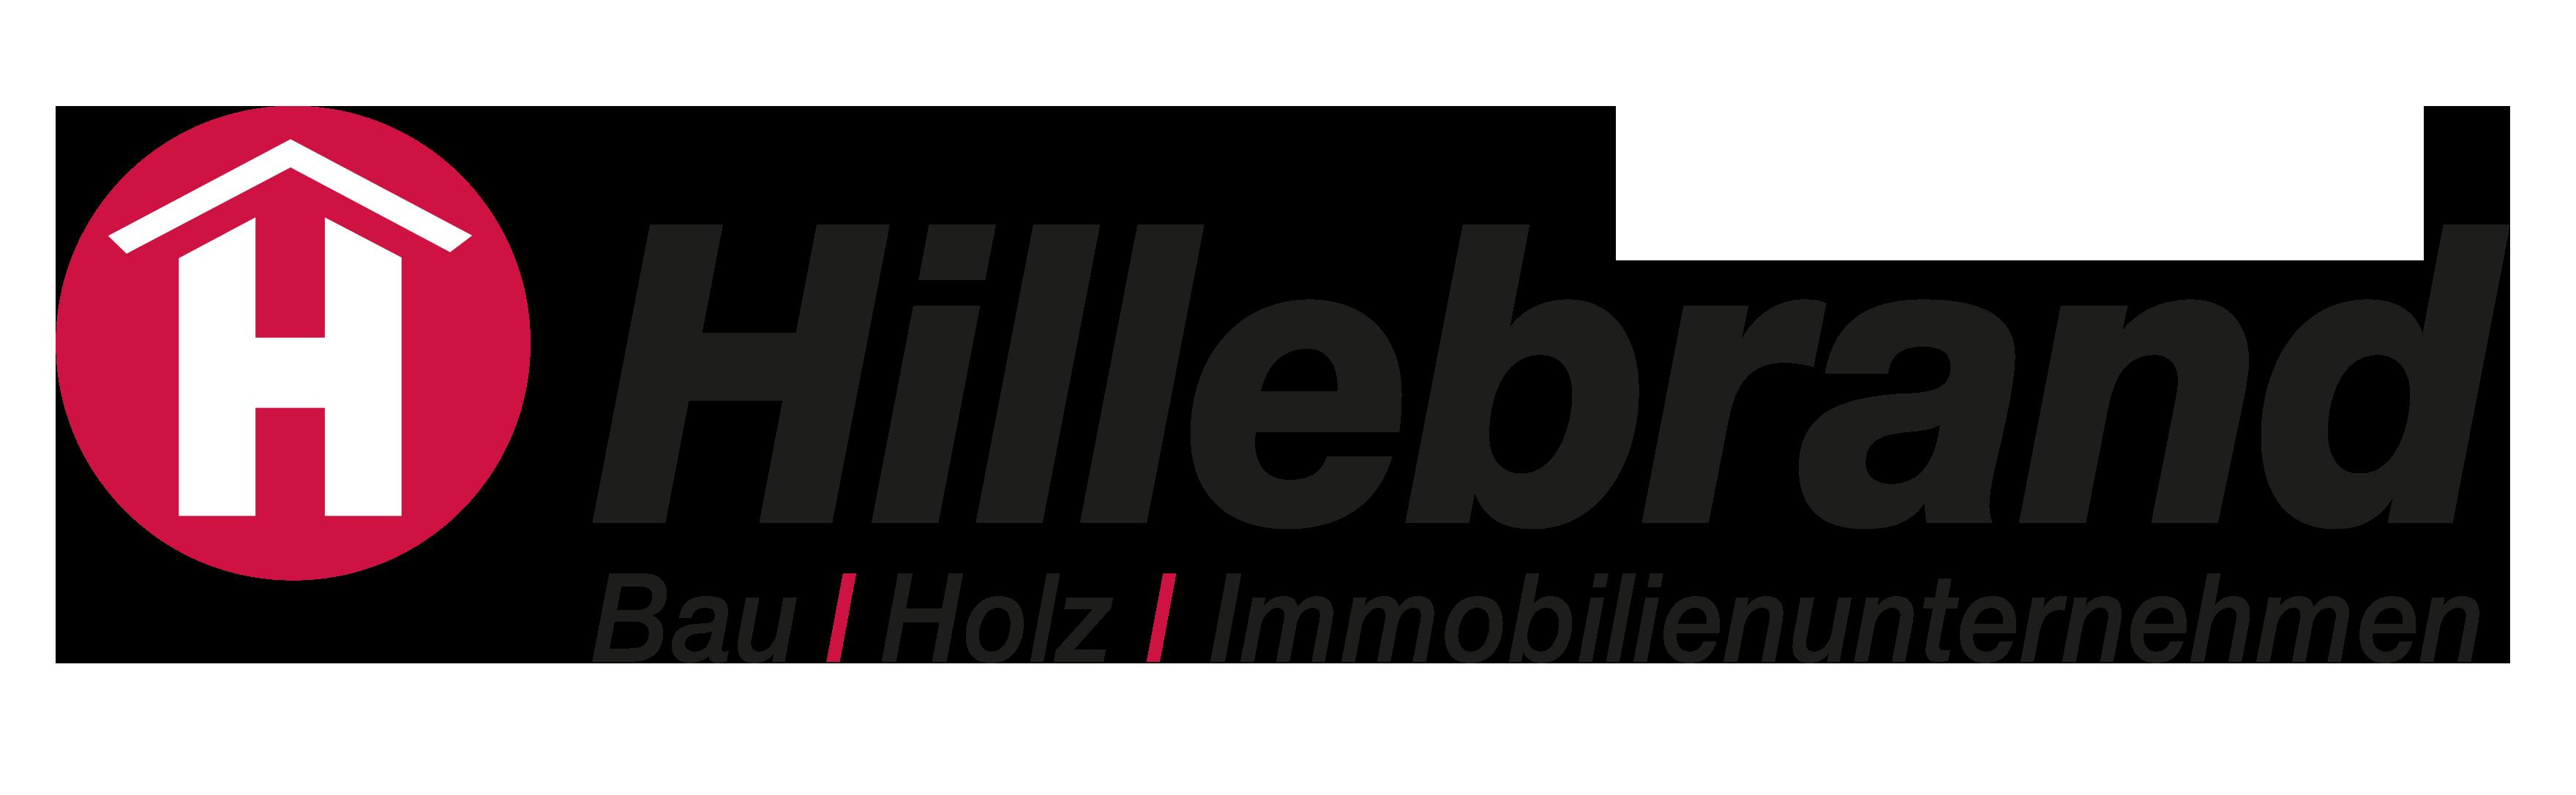 Logo Hillebrand_Bau Holz Immo